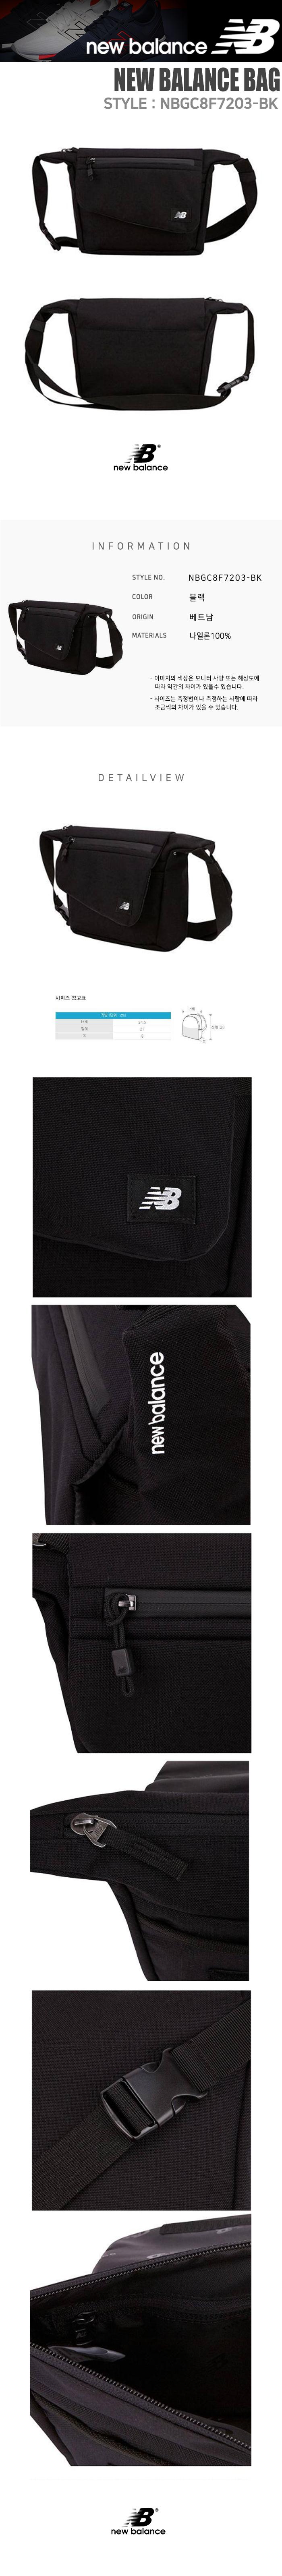 NBGC8F7203-BK.jpg